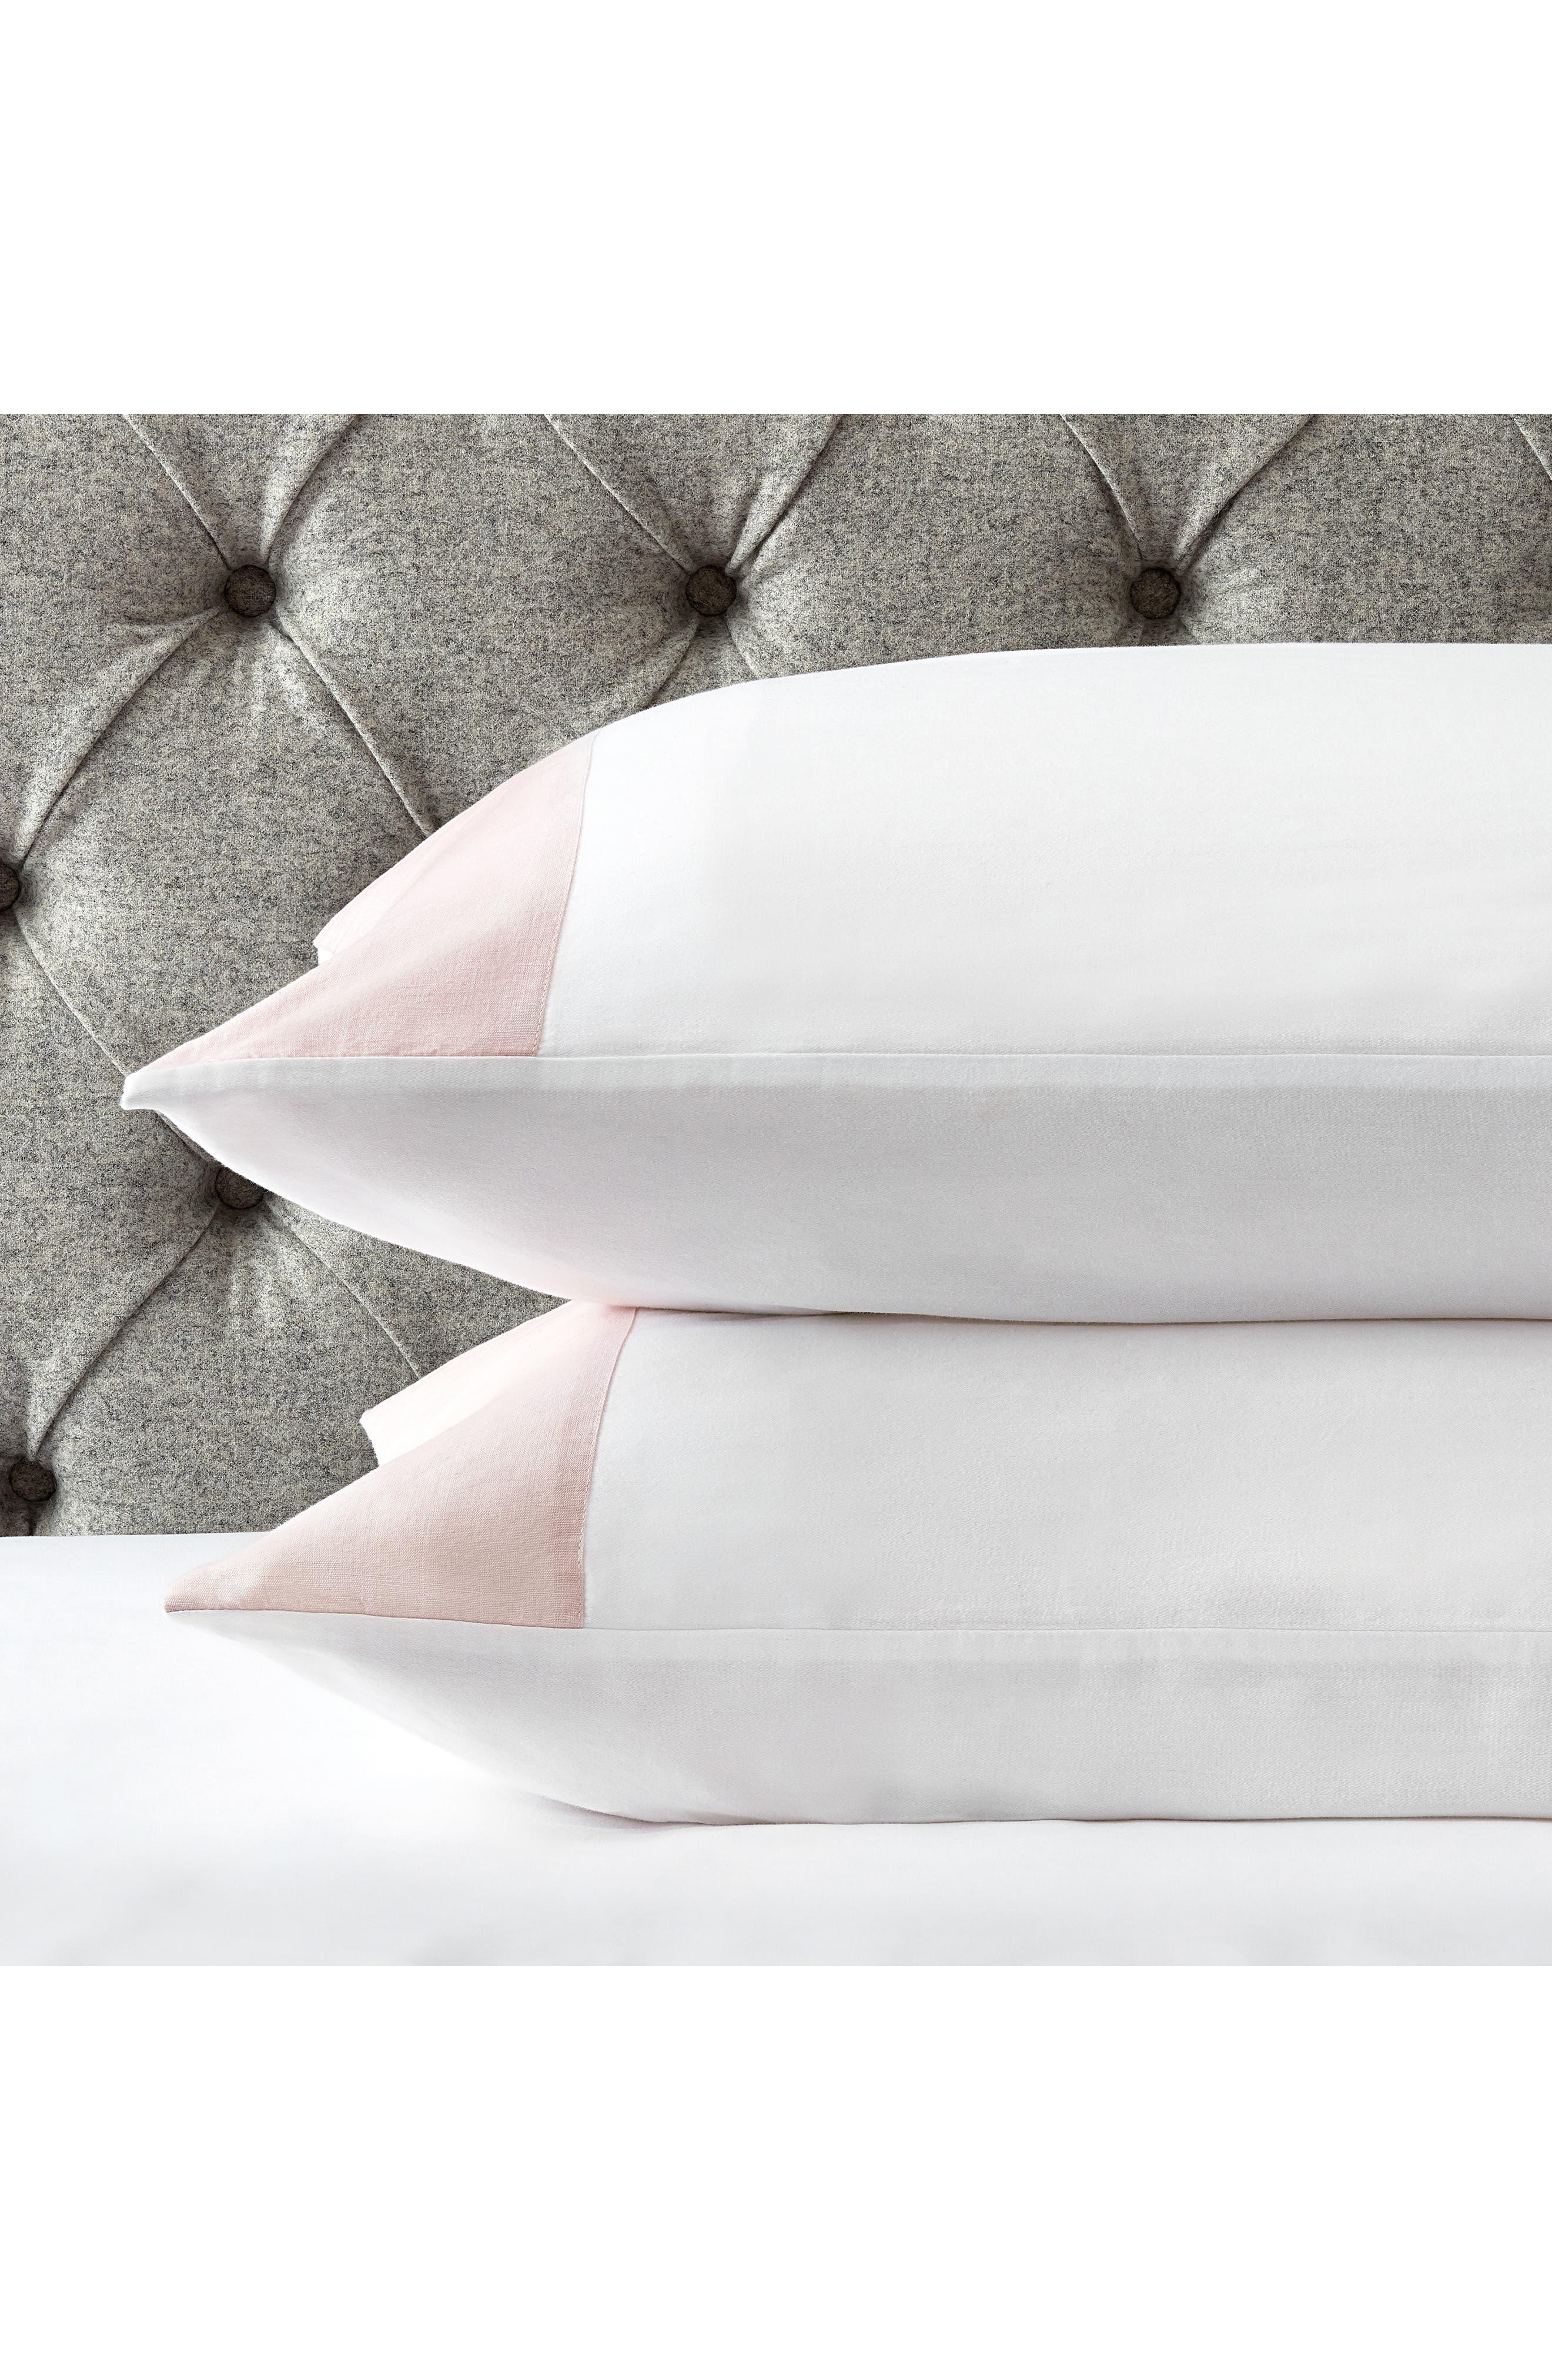 THE WHITE COMPANY, Portobello Pillowcase, Main thumbnail 1, color, PETAL/ WHITE